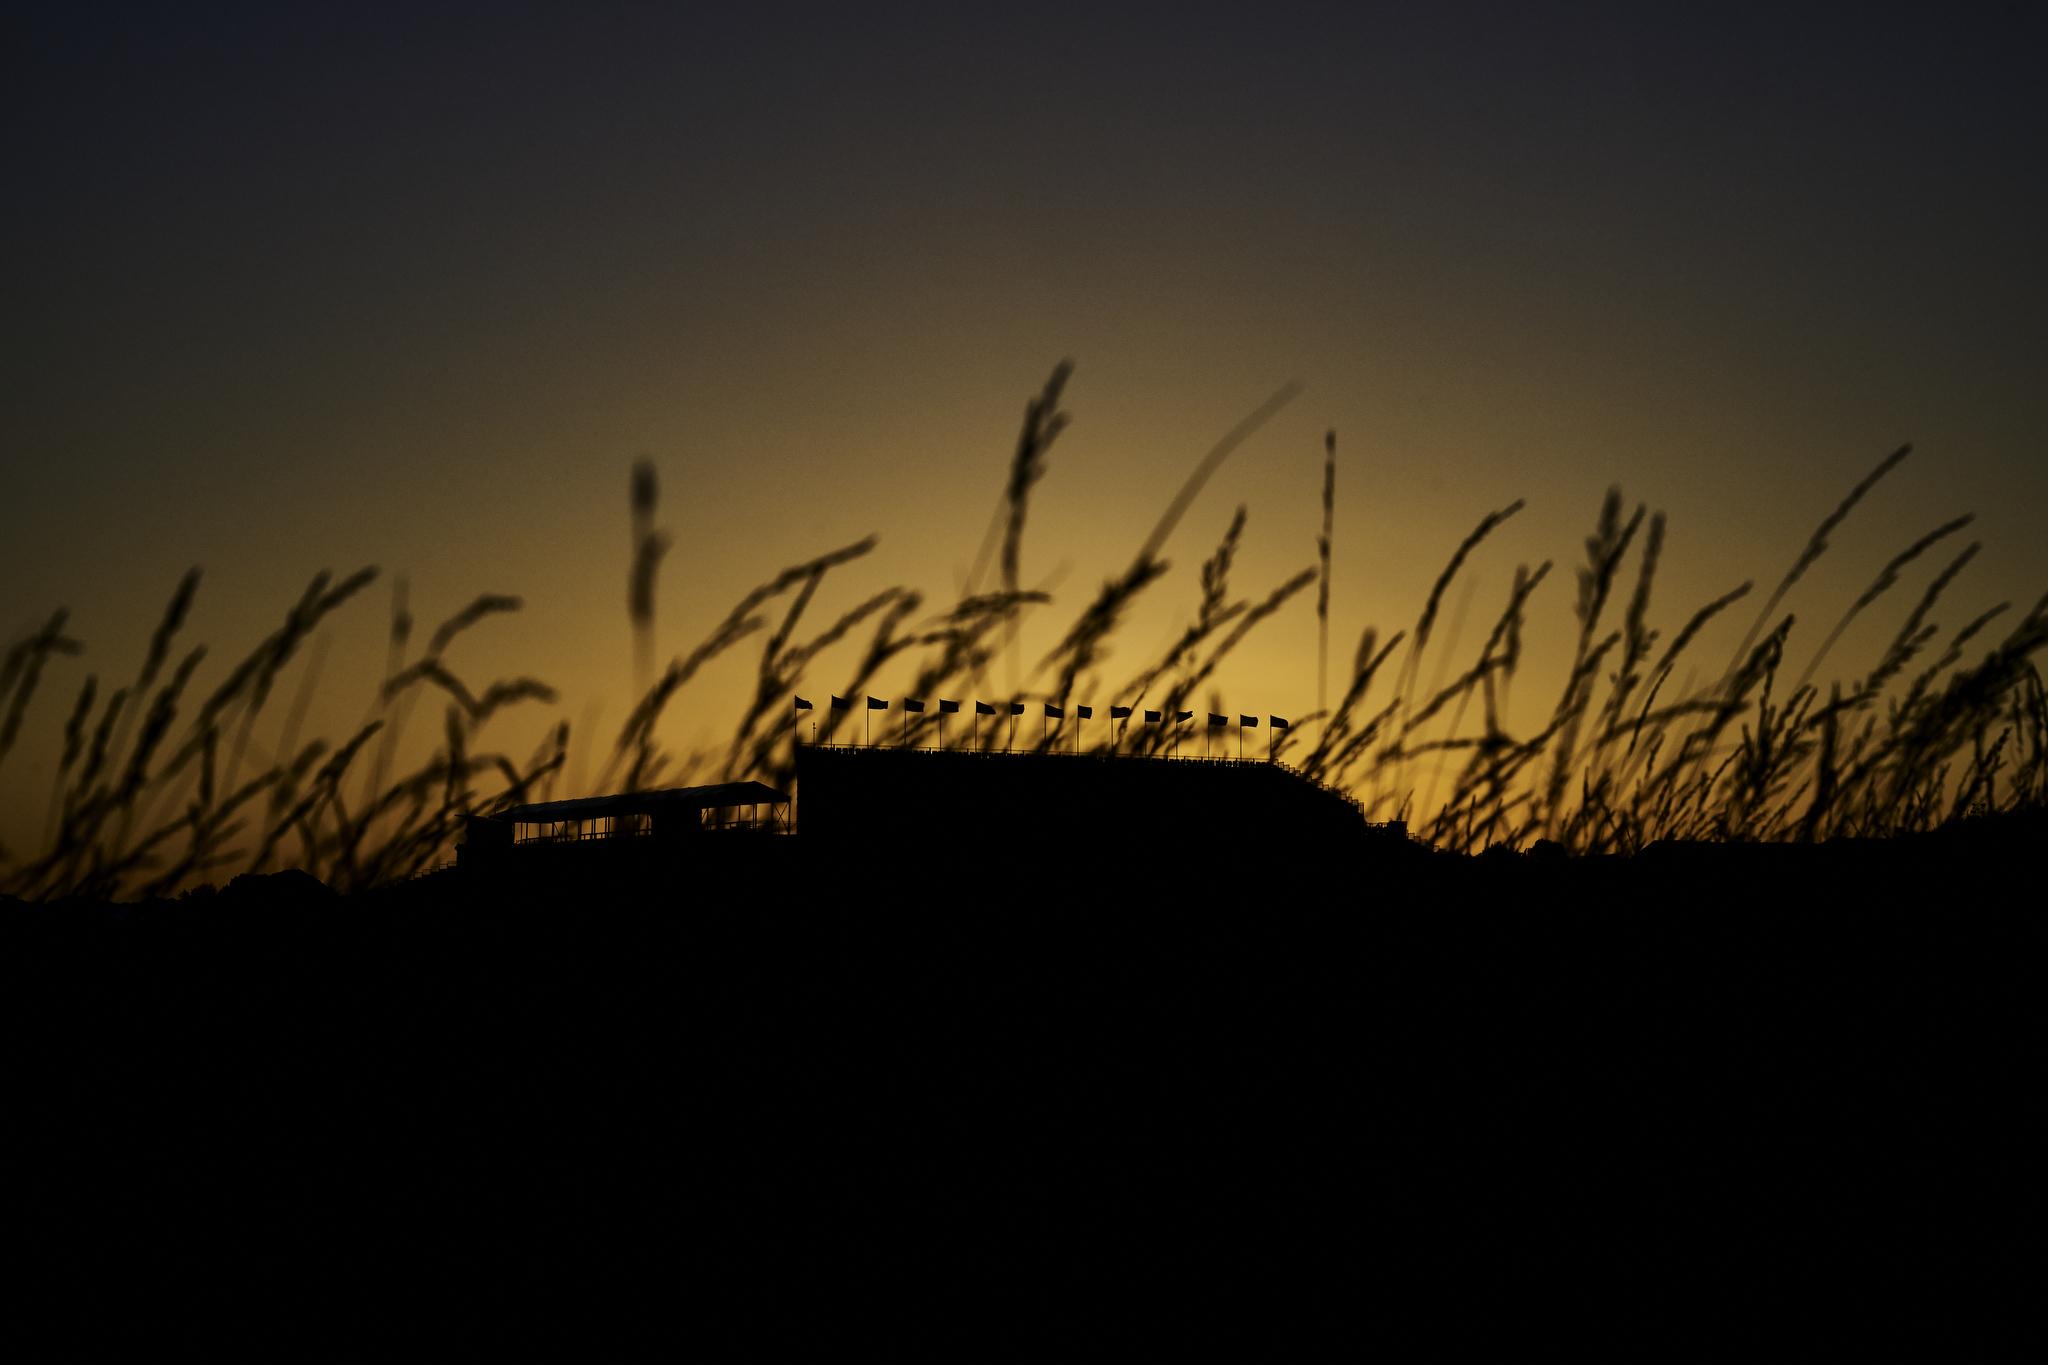 18th hole grandstand at sunrise.   Sony A9, Sony 24-70mm f2.8 GM. ©USGA/Darren Carroll